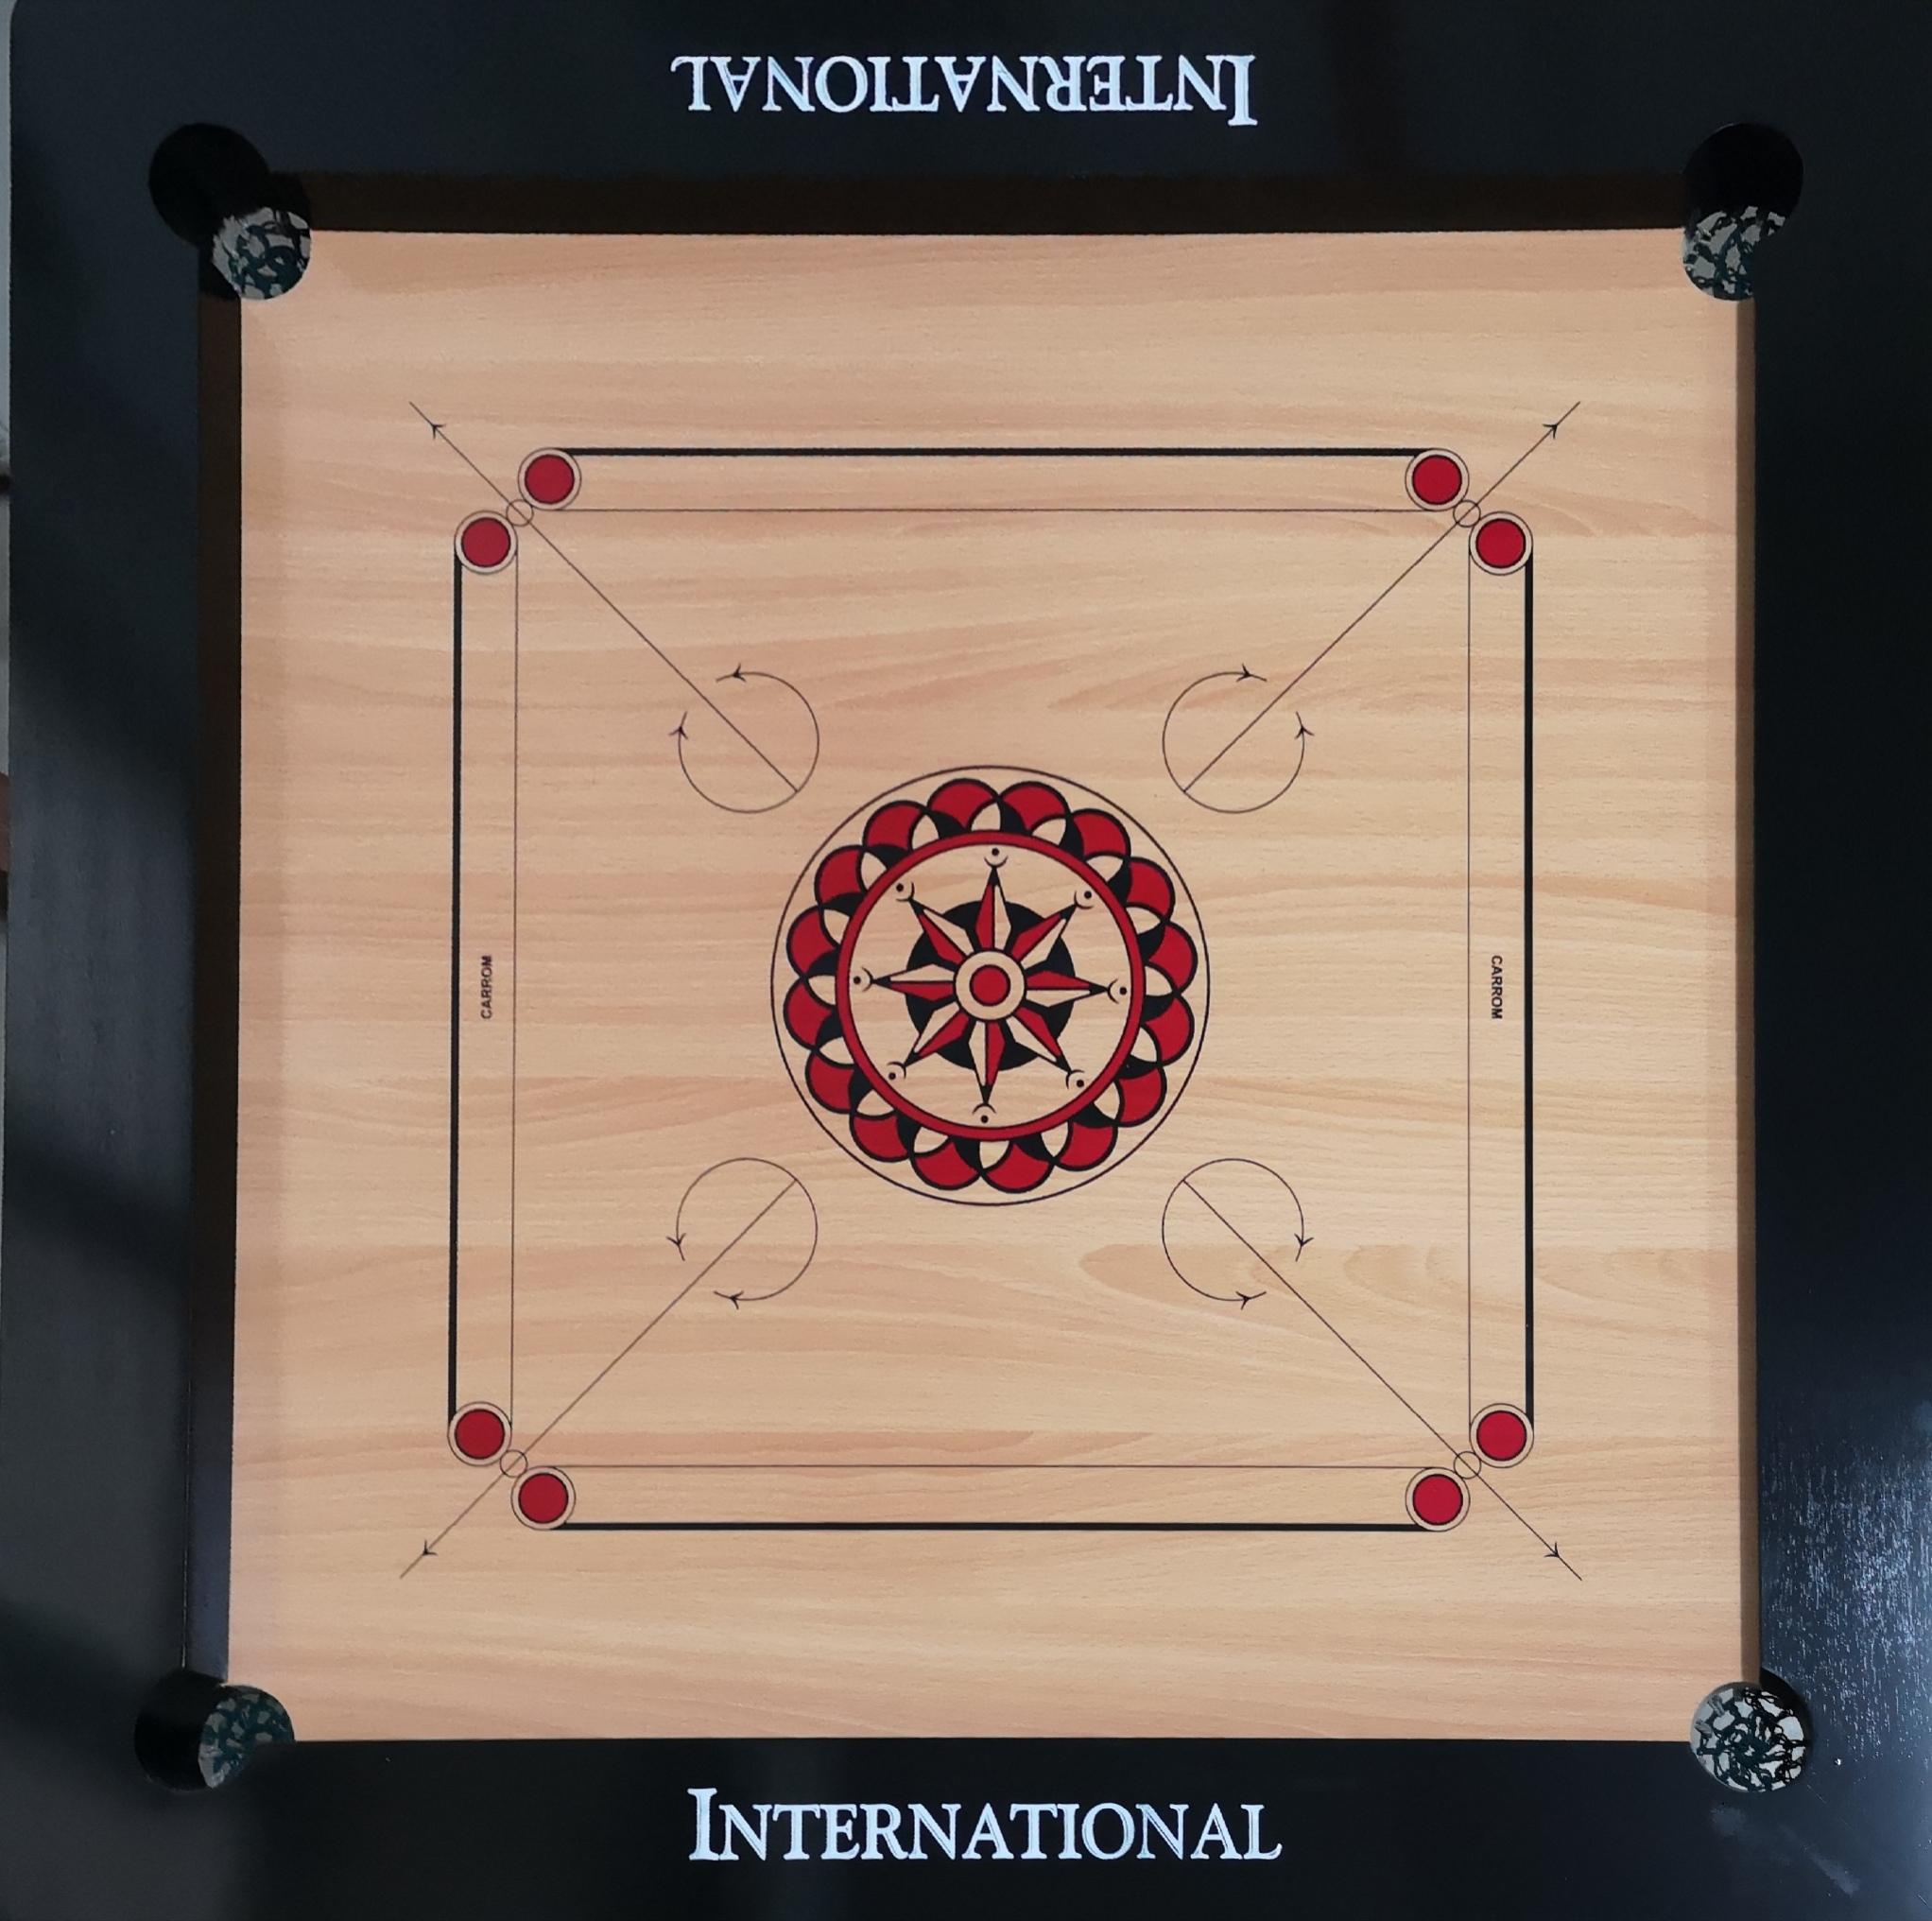 GC919 International Carrom Board Set with Carrom Men/Stricker (Size: 93.0 x 93.0 cm)